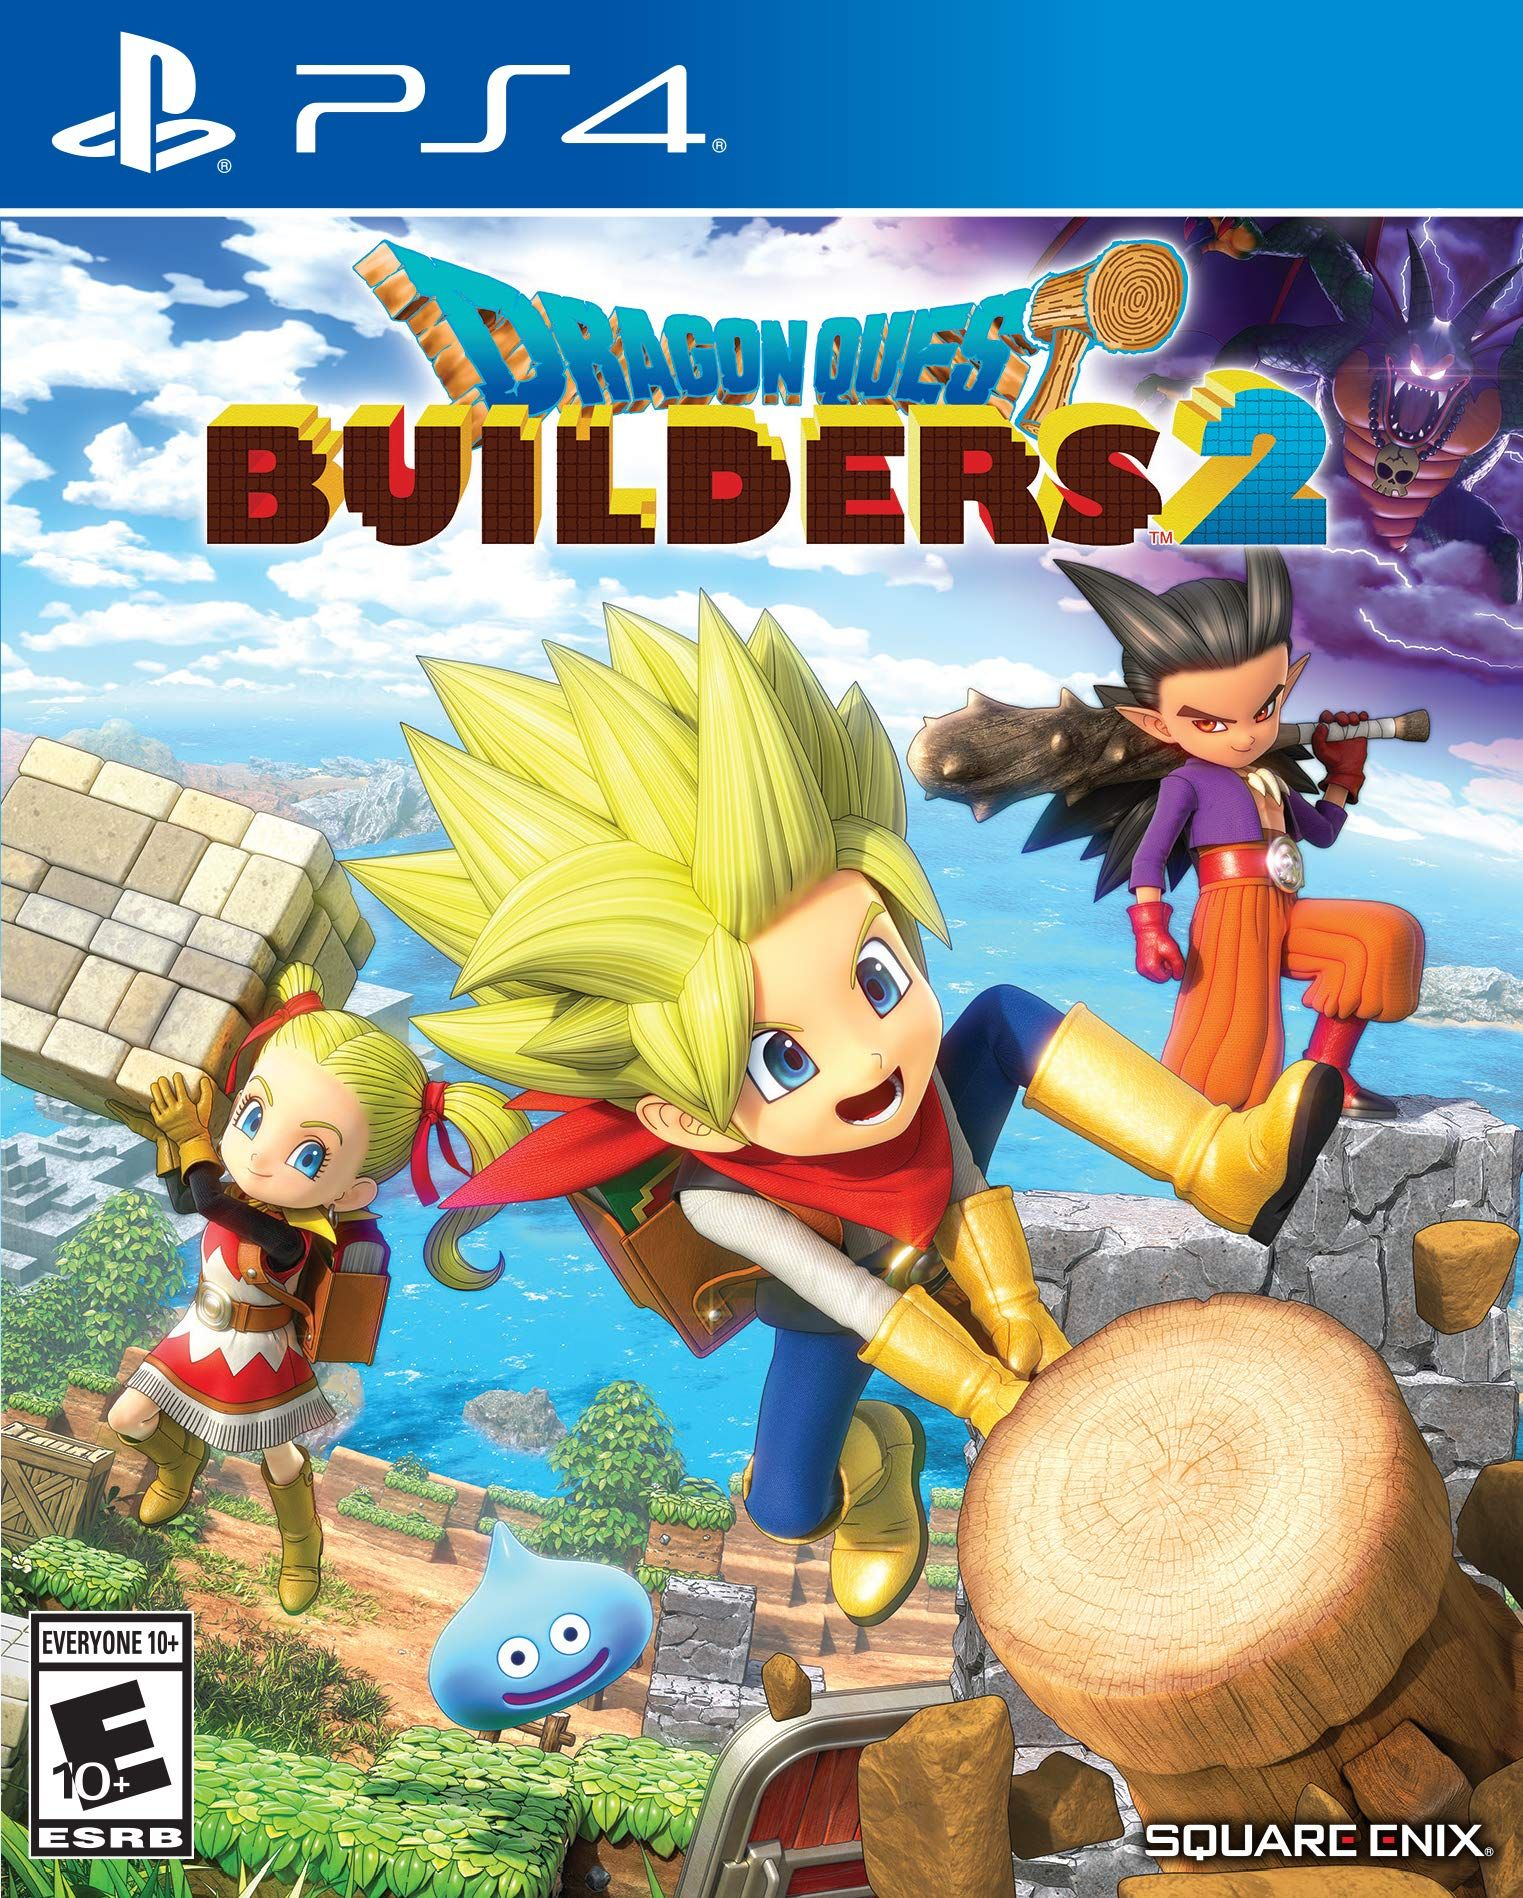 Dragon Quest Builders 2 Dragon quest, Video games ps4